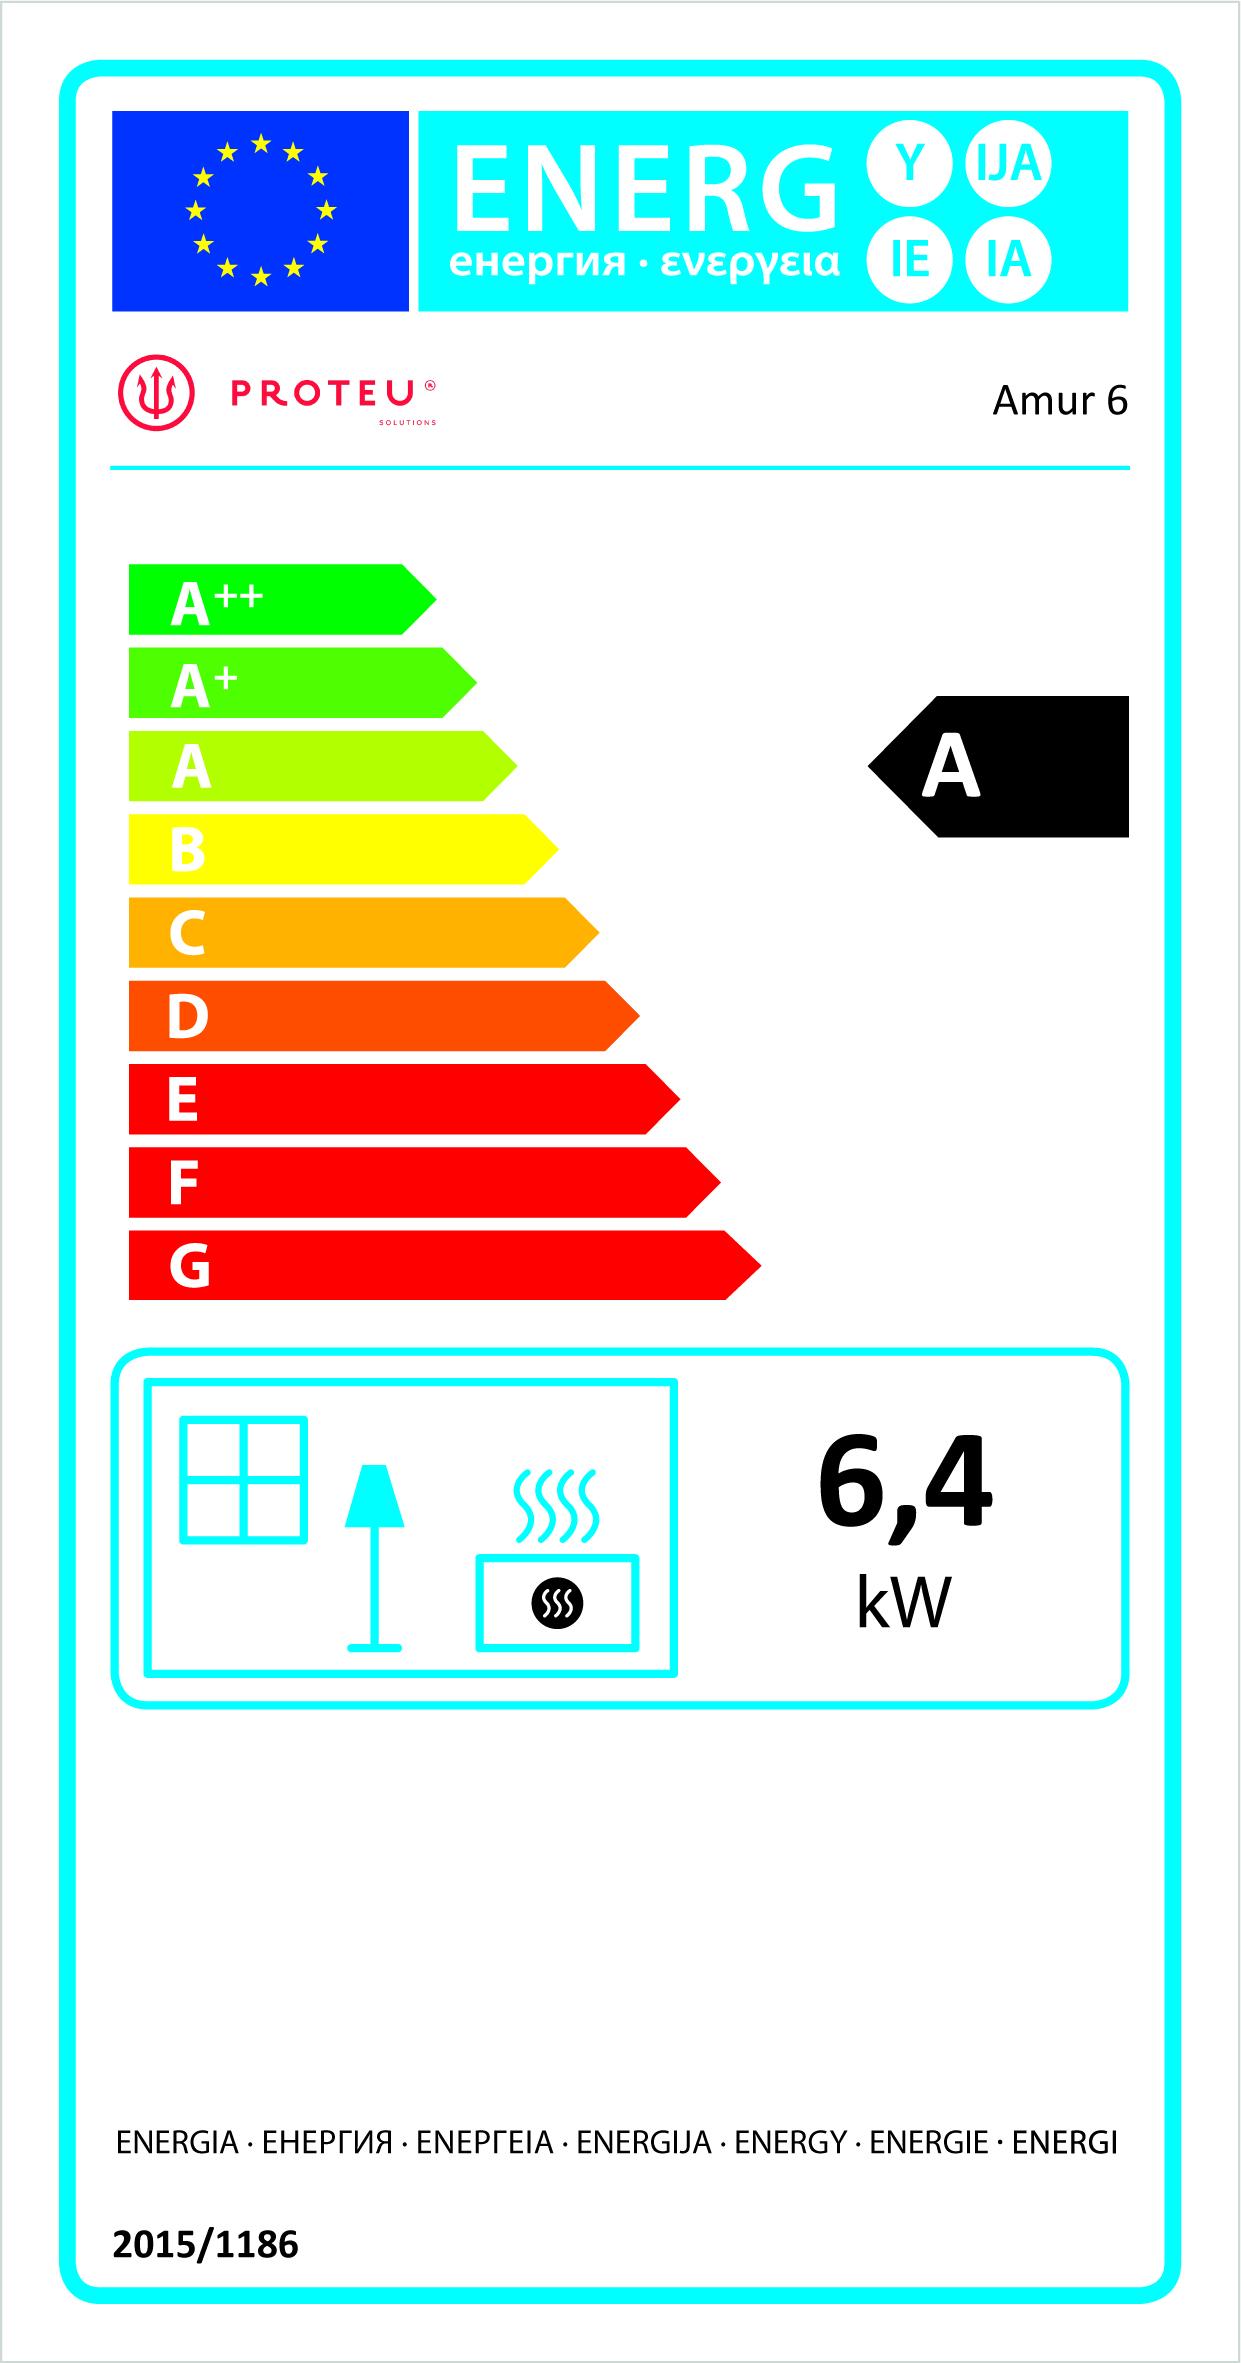 Etiqueta Energética Amur 6